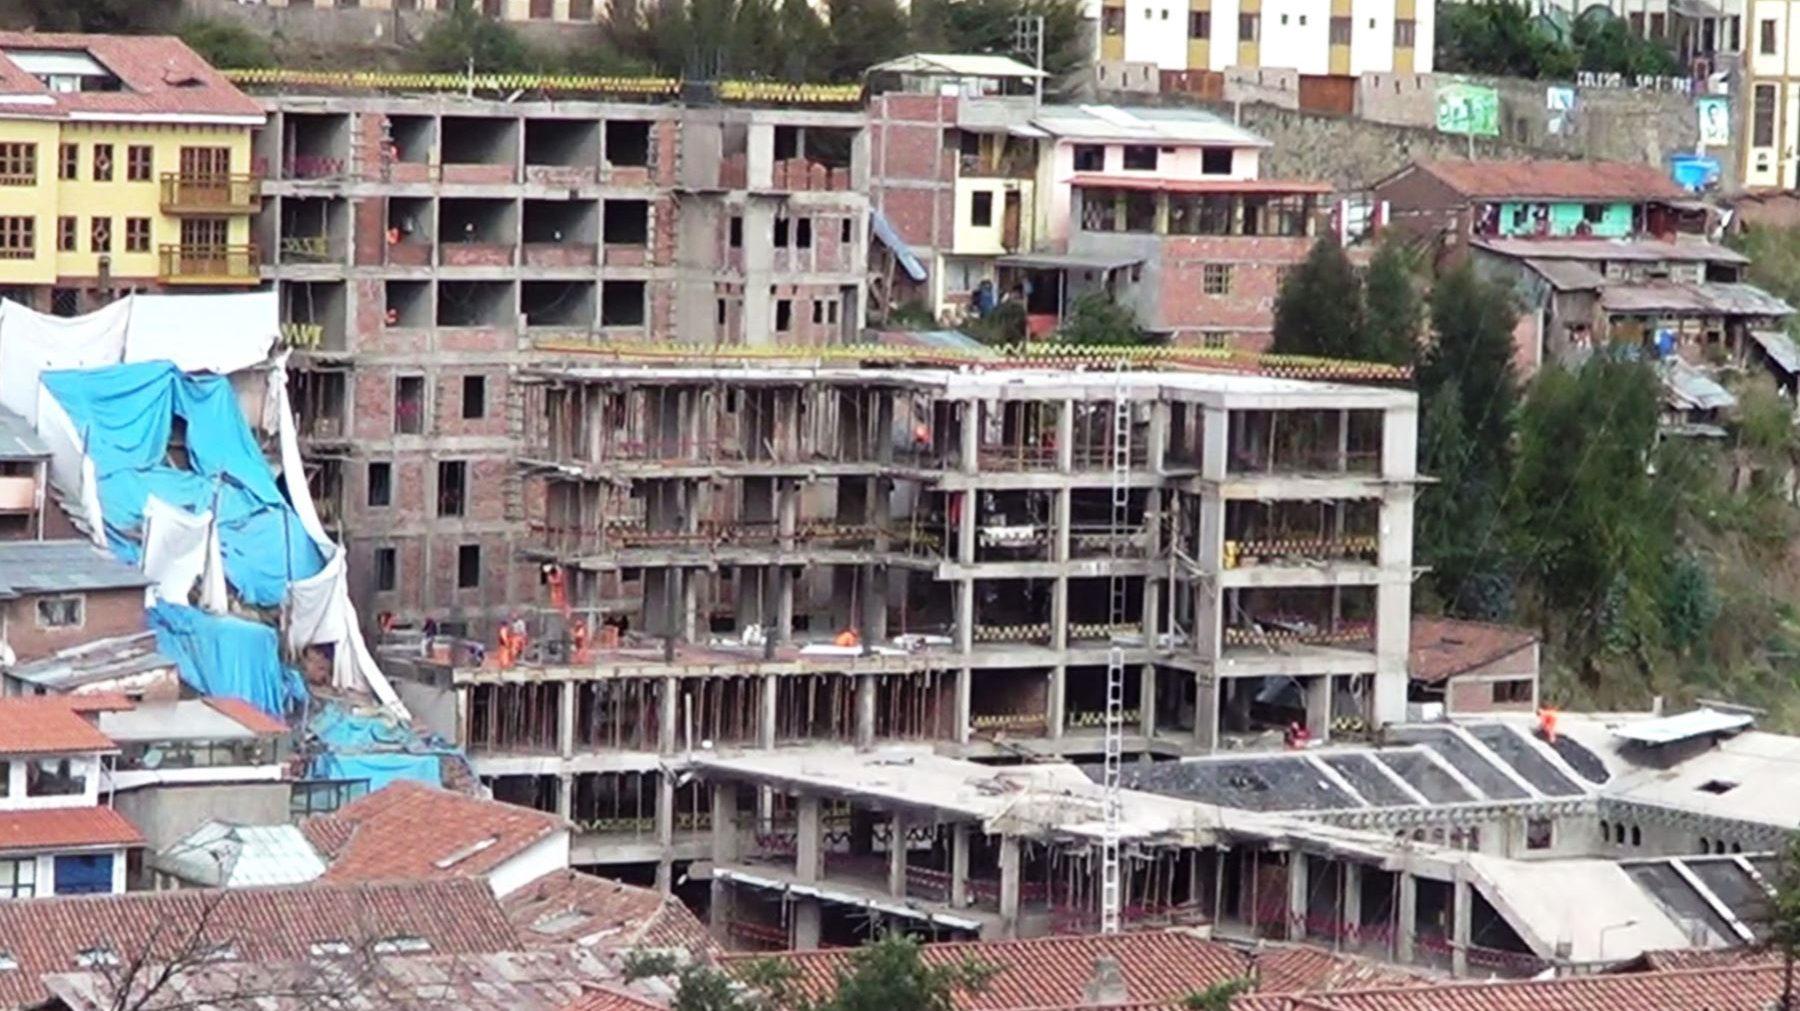 Poder Judicial ordena demolición del hotel Sheraton de Cusco por daños a muros incas prehispánicos